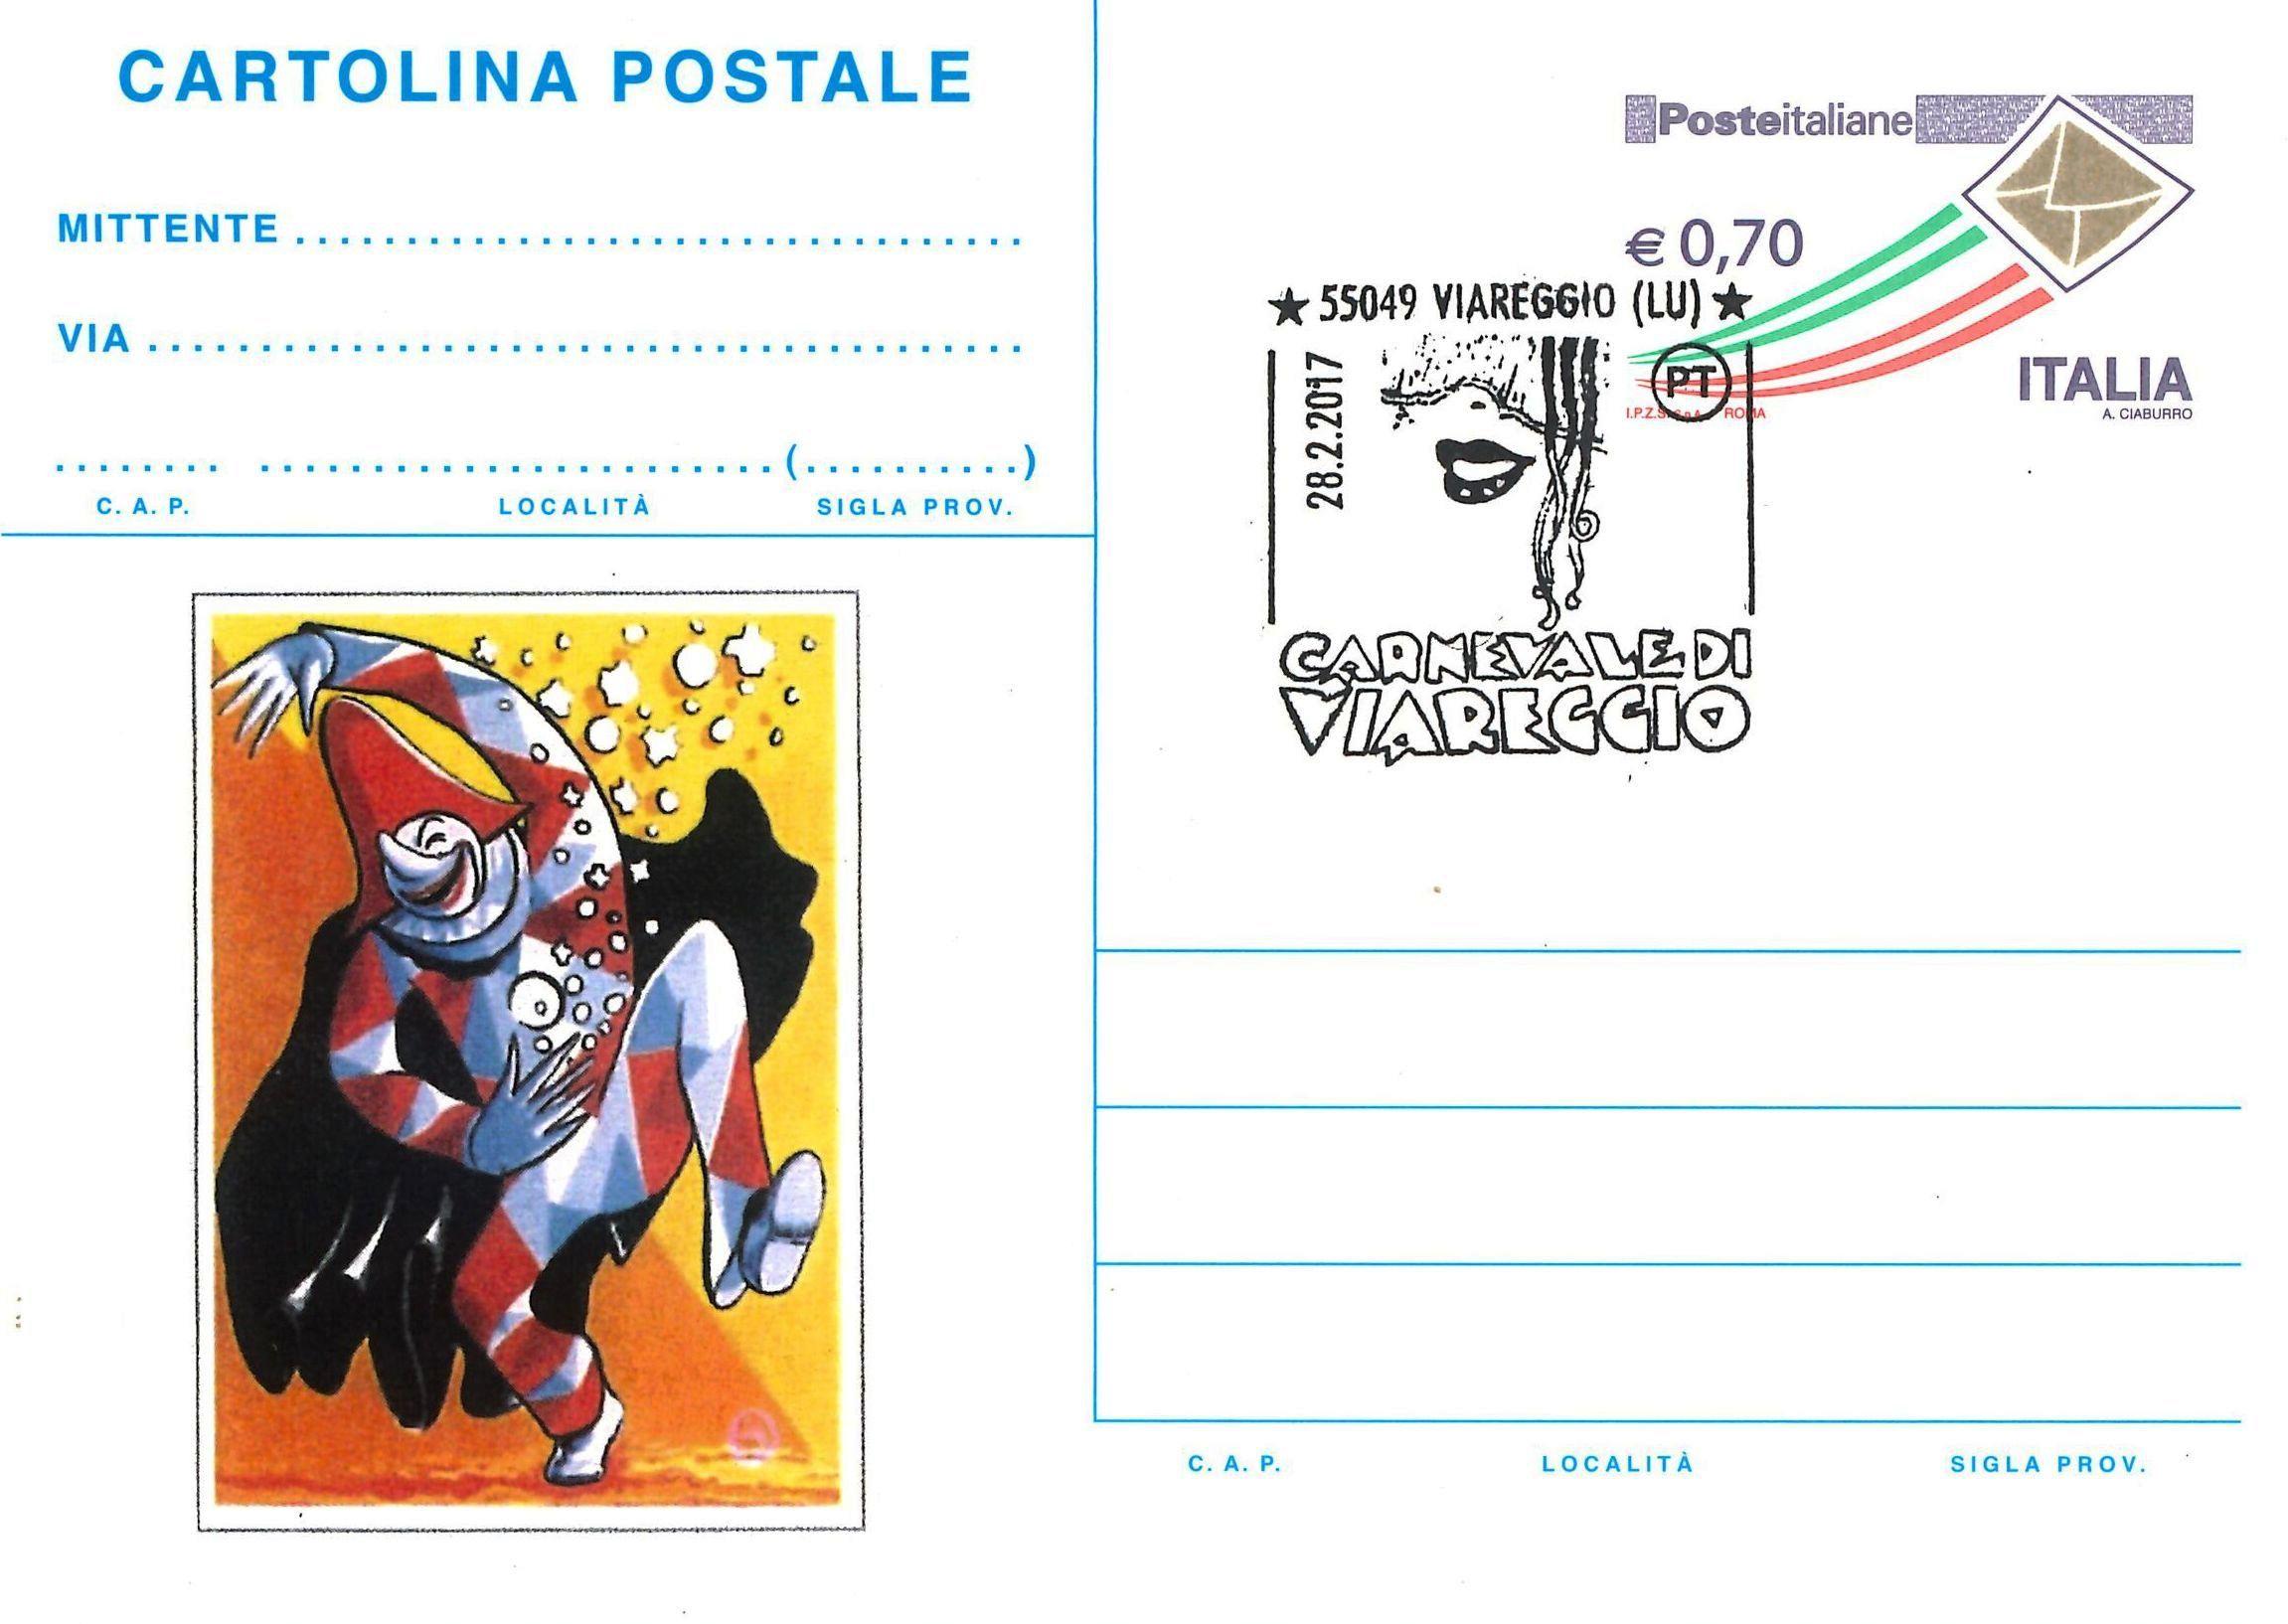 2017-02-28 Cartolina Postale 1 – fronte